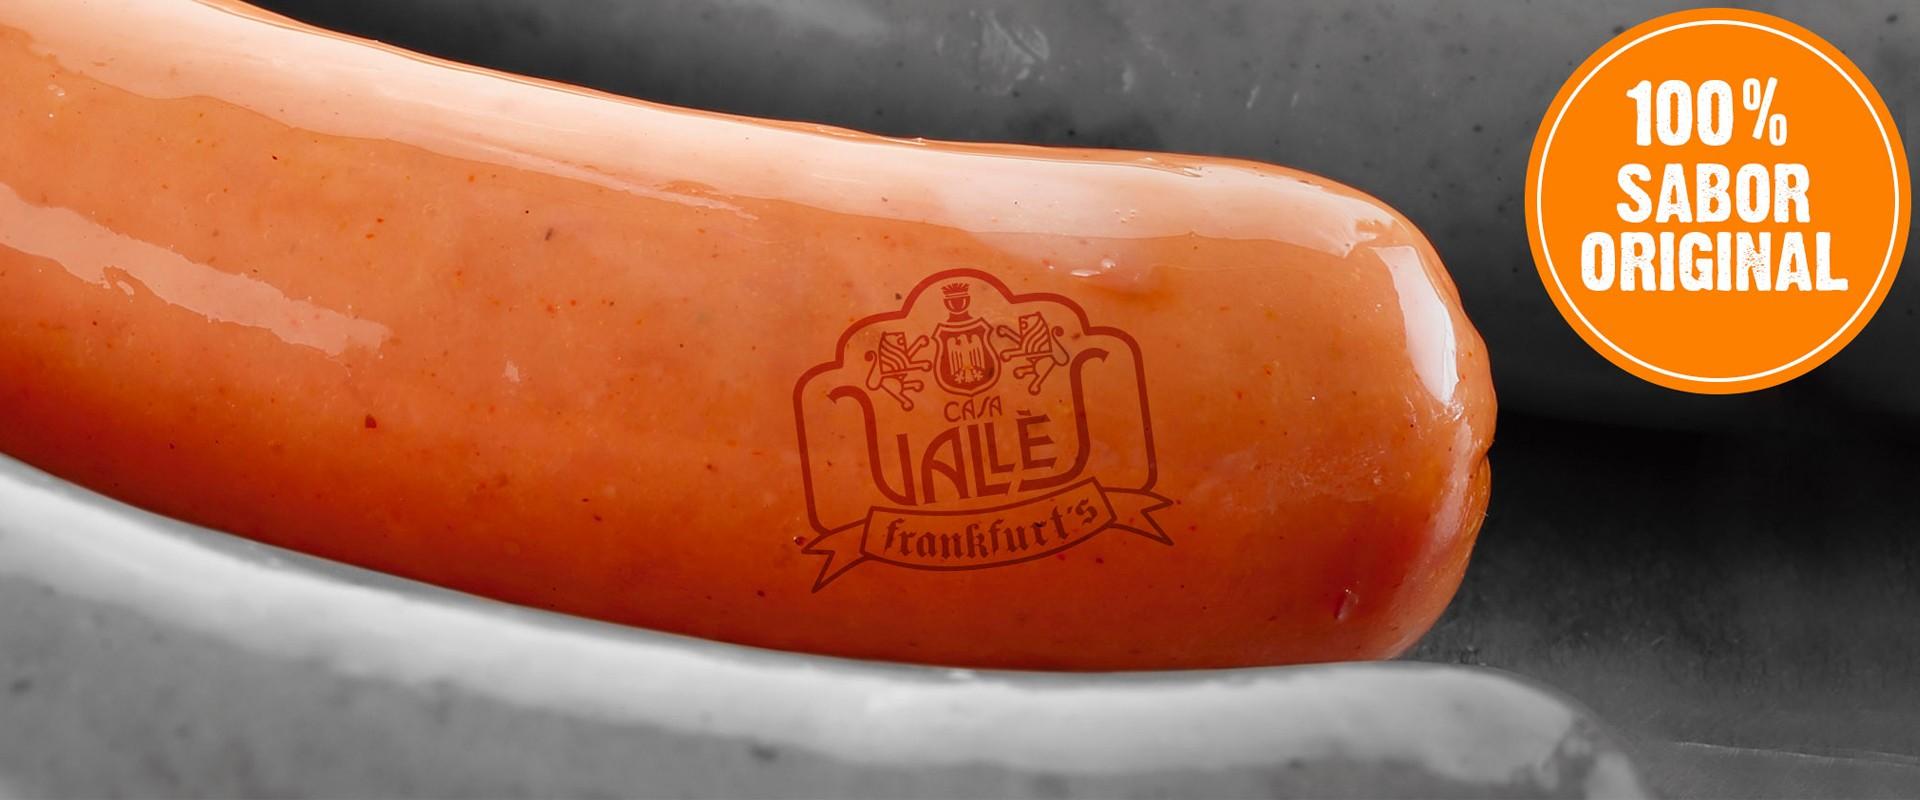 100% sabor original CasaValles